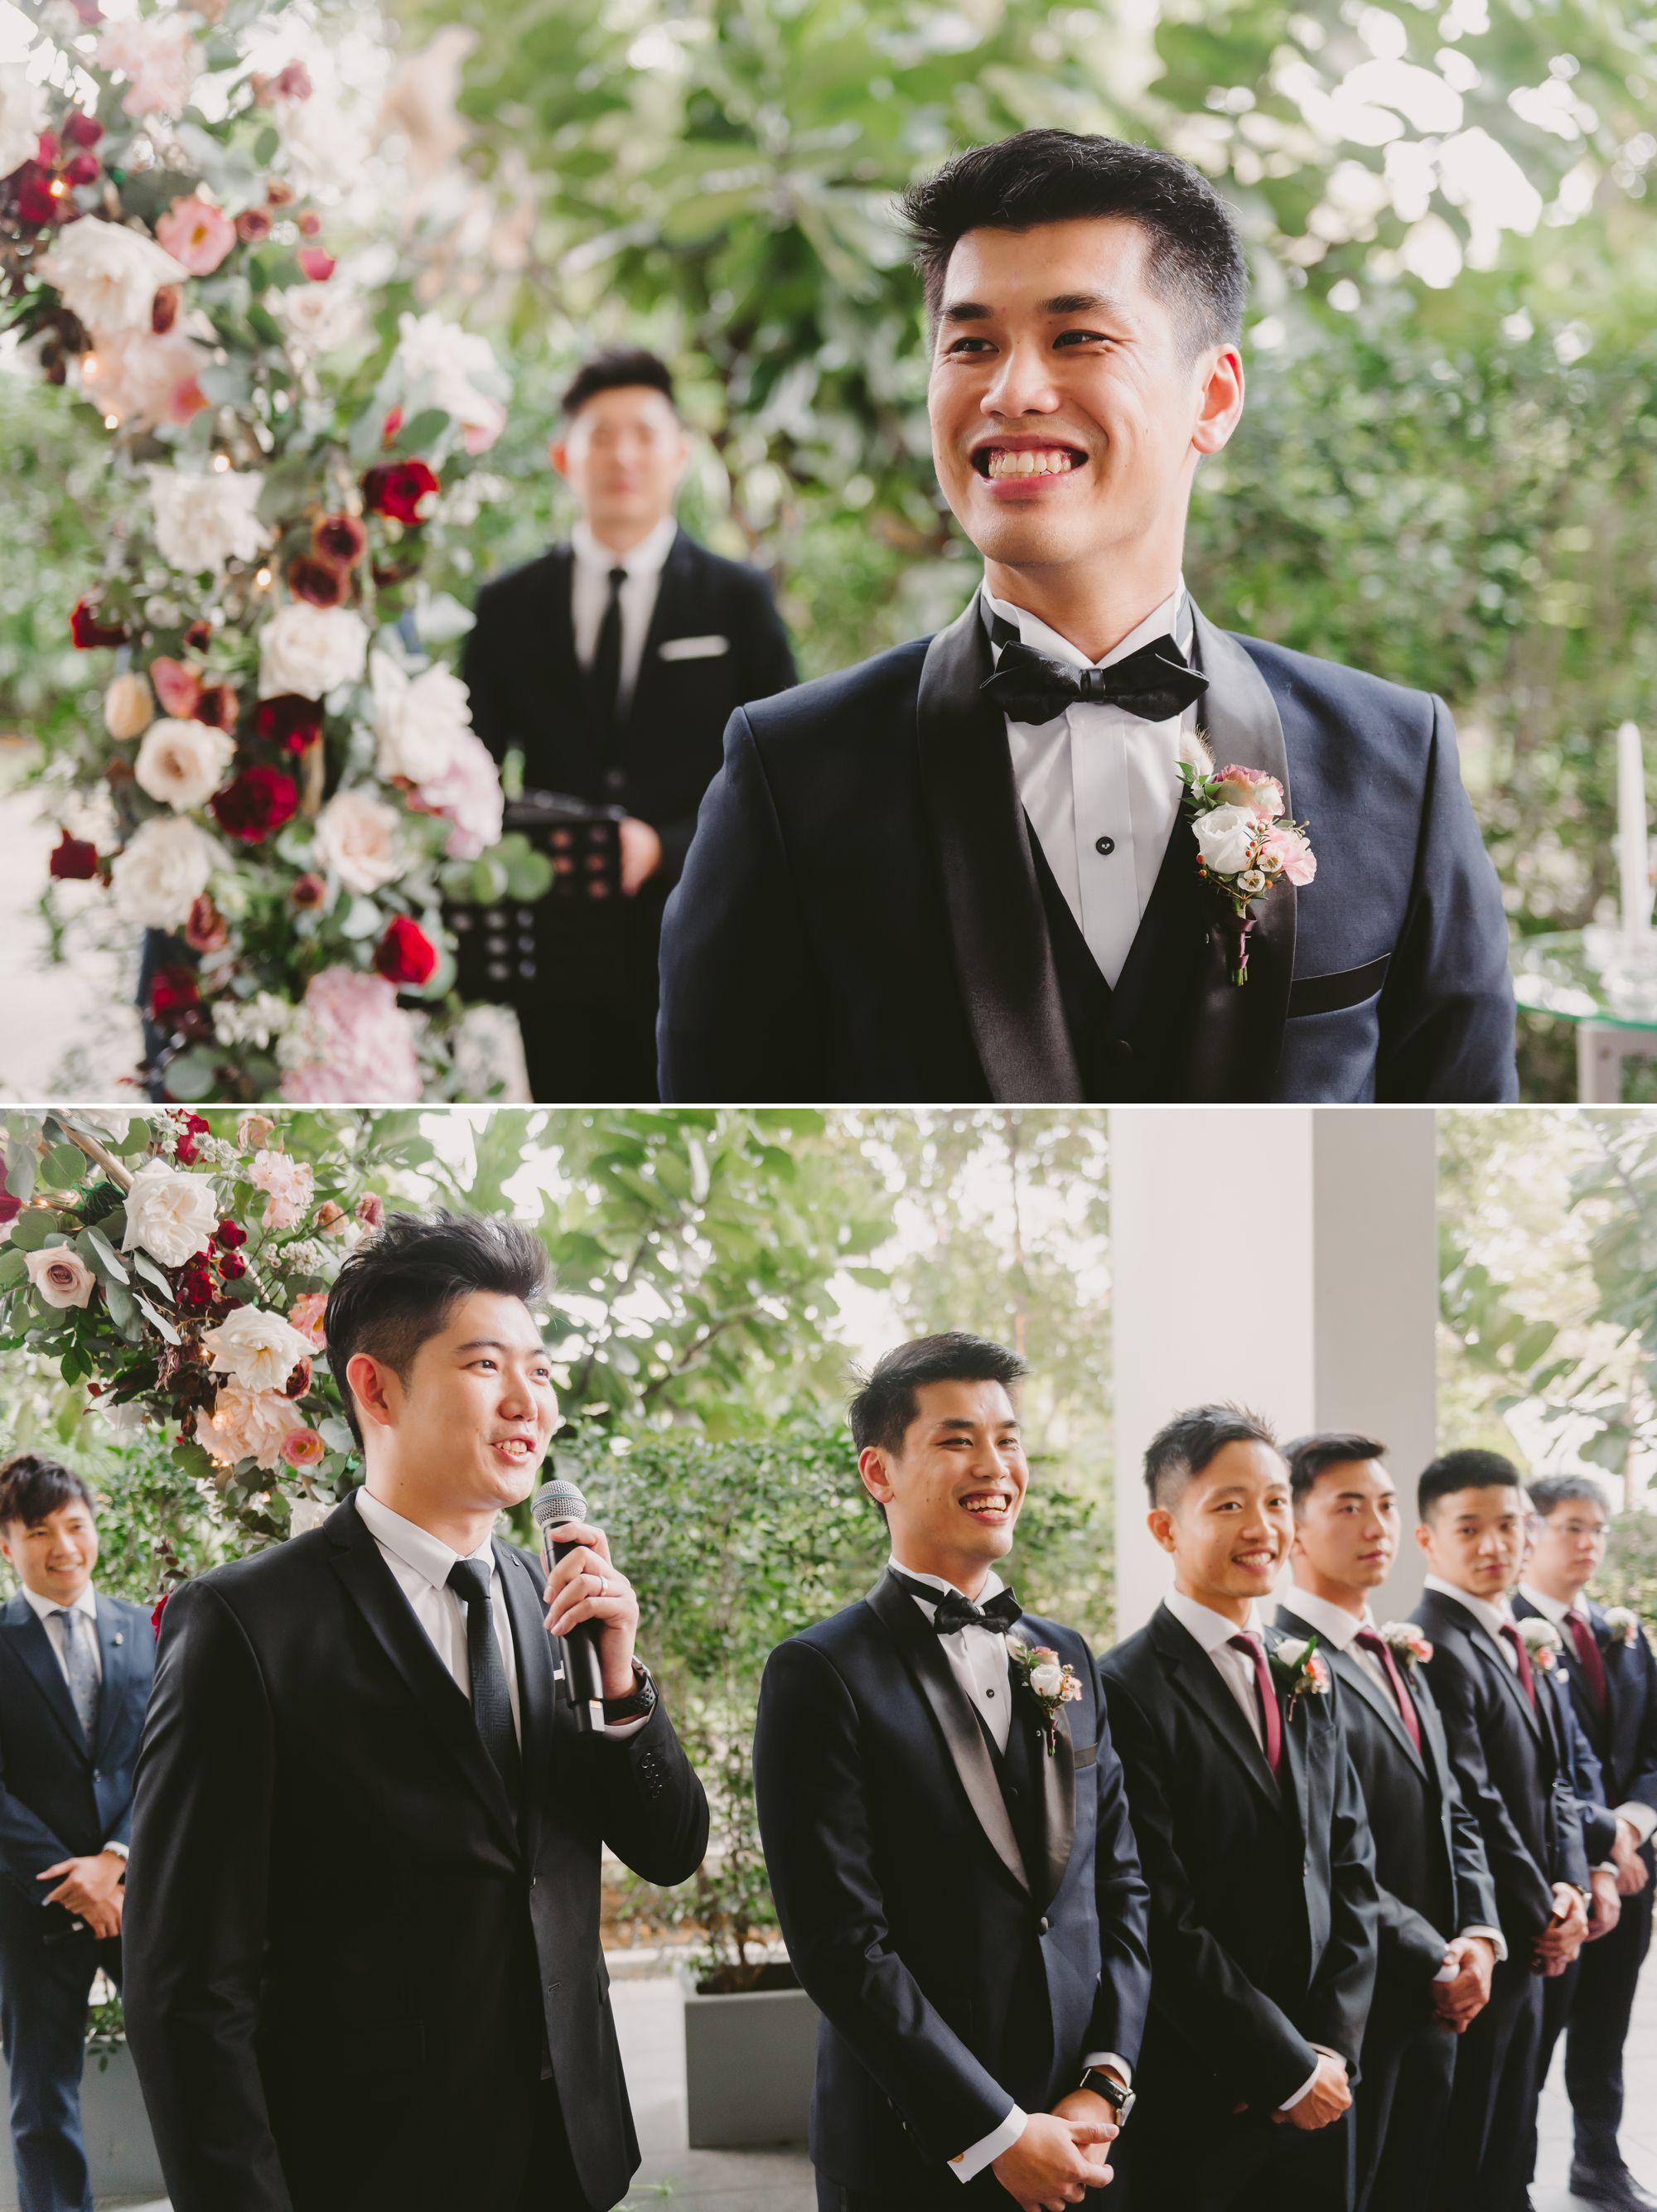 capella_wedding_photography_ 37.jpg